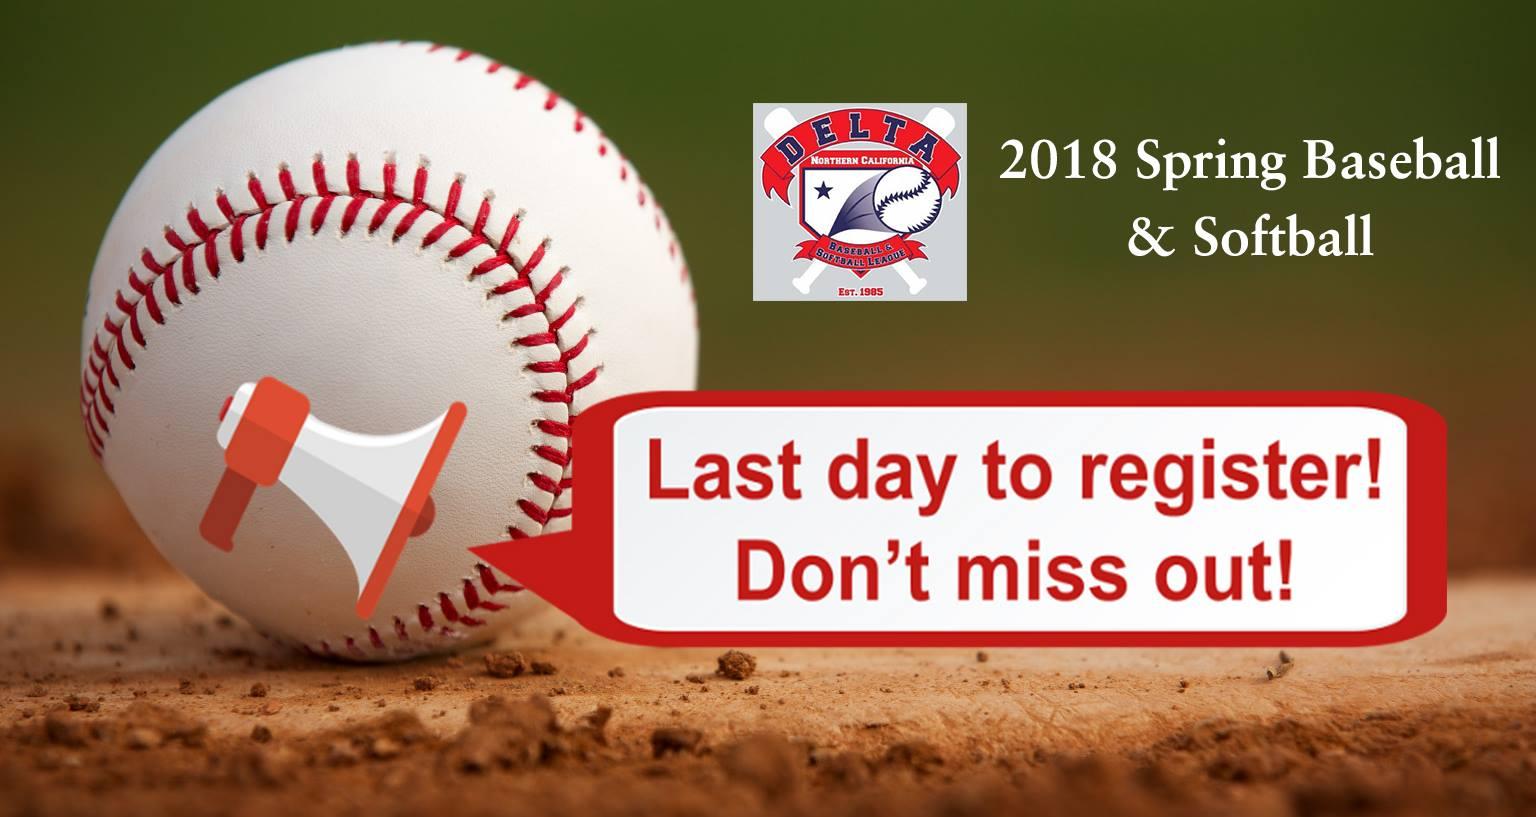 Delta Baseball and Softball League